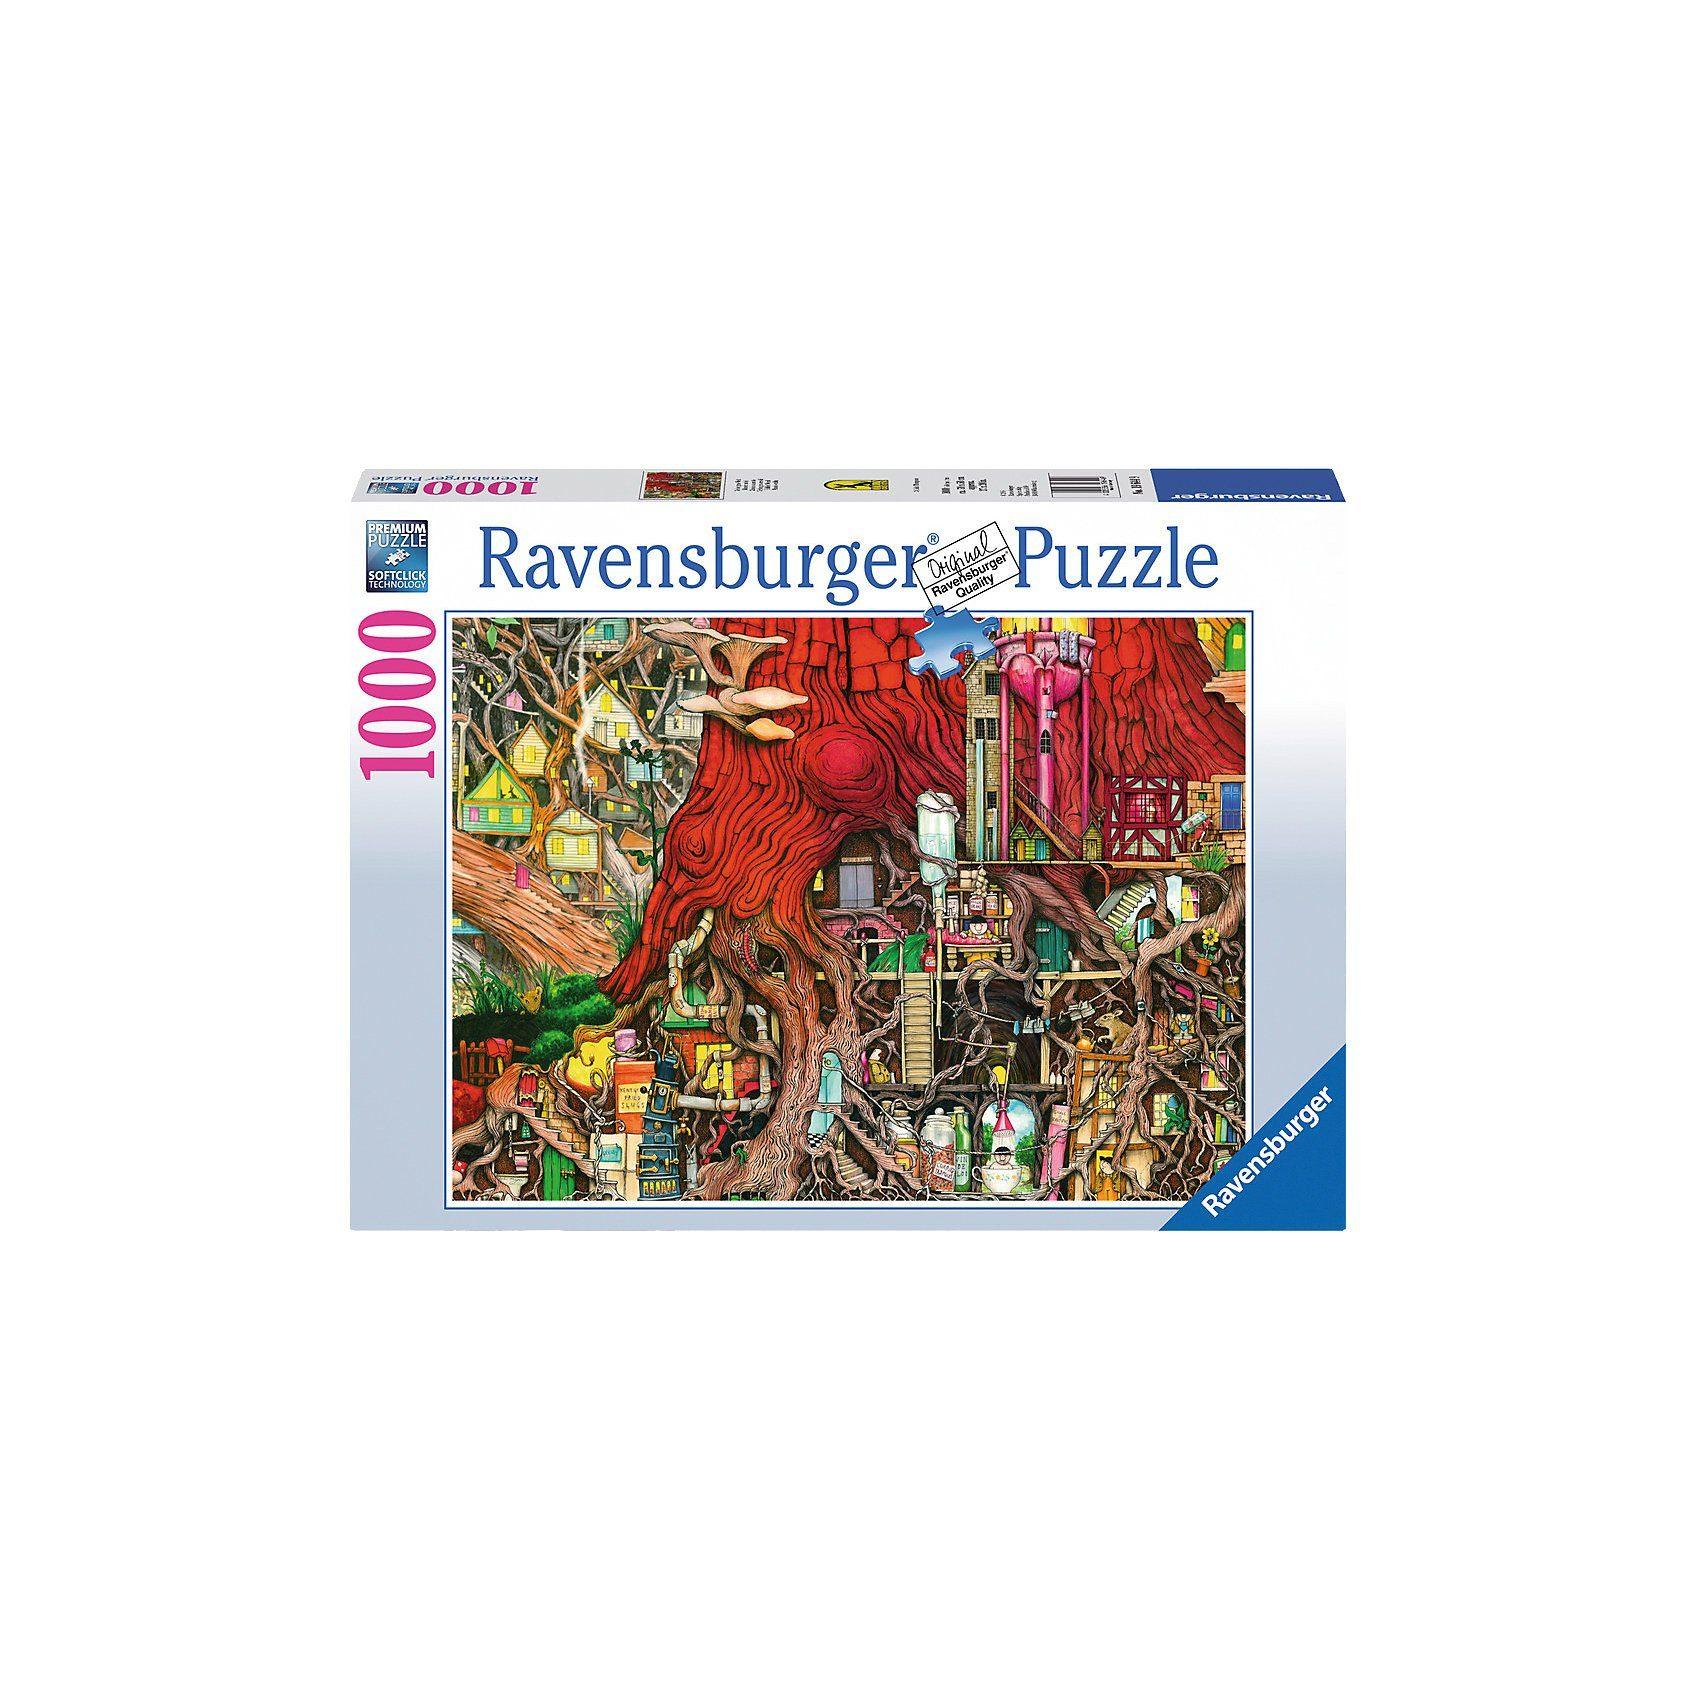 Ravensburger Puzzle 1000 Teile Verborgene Welt